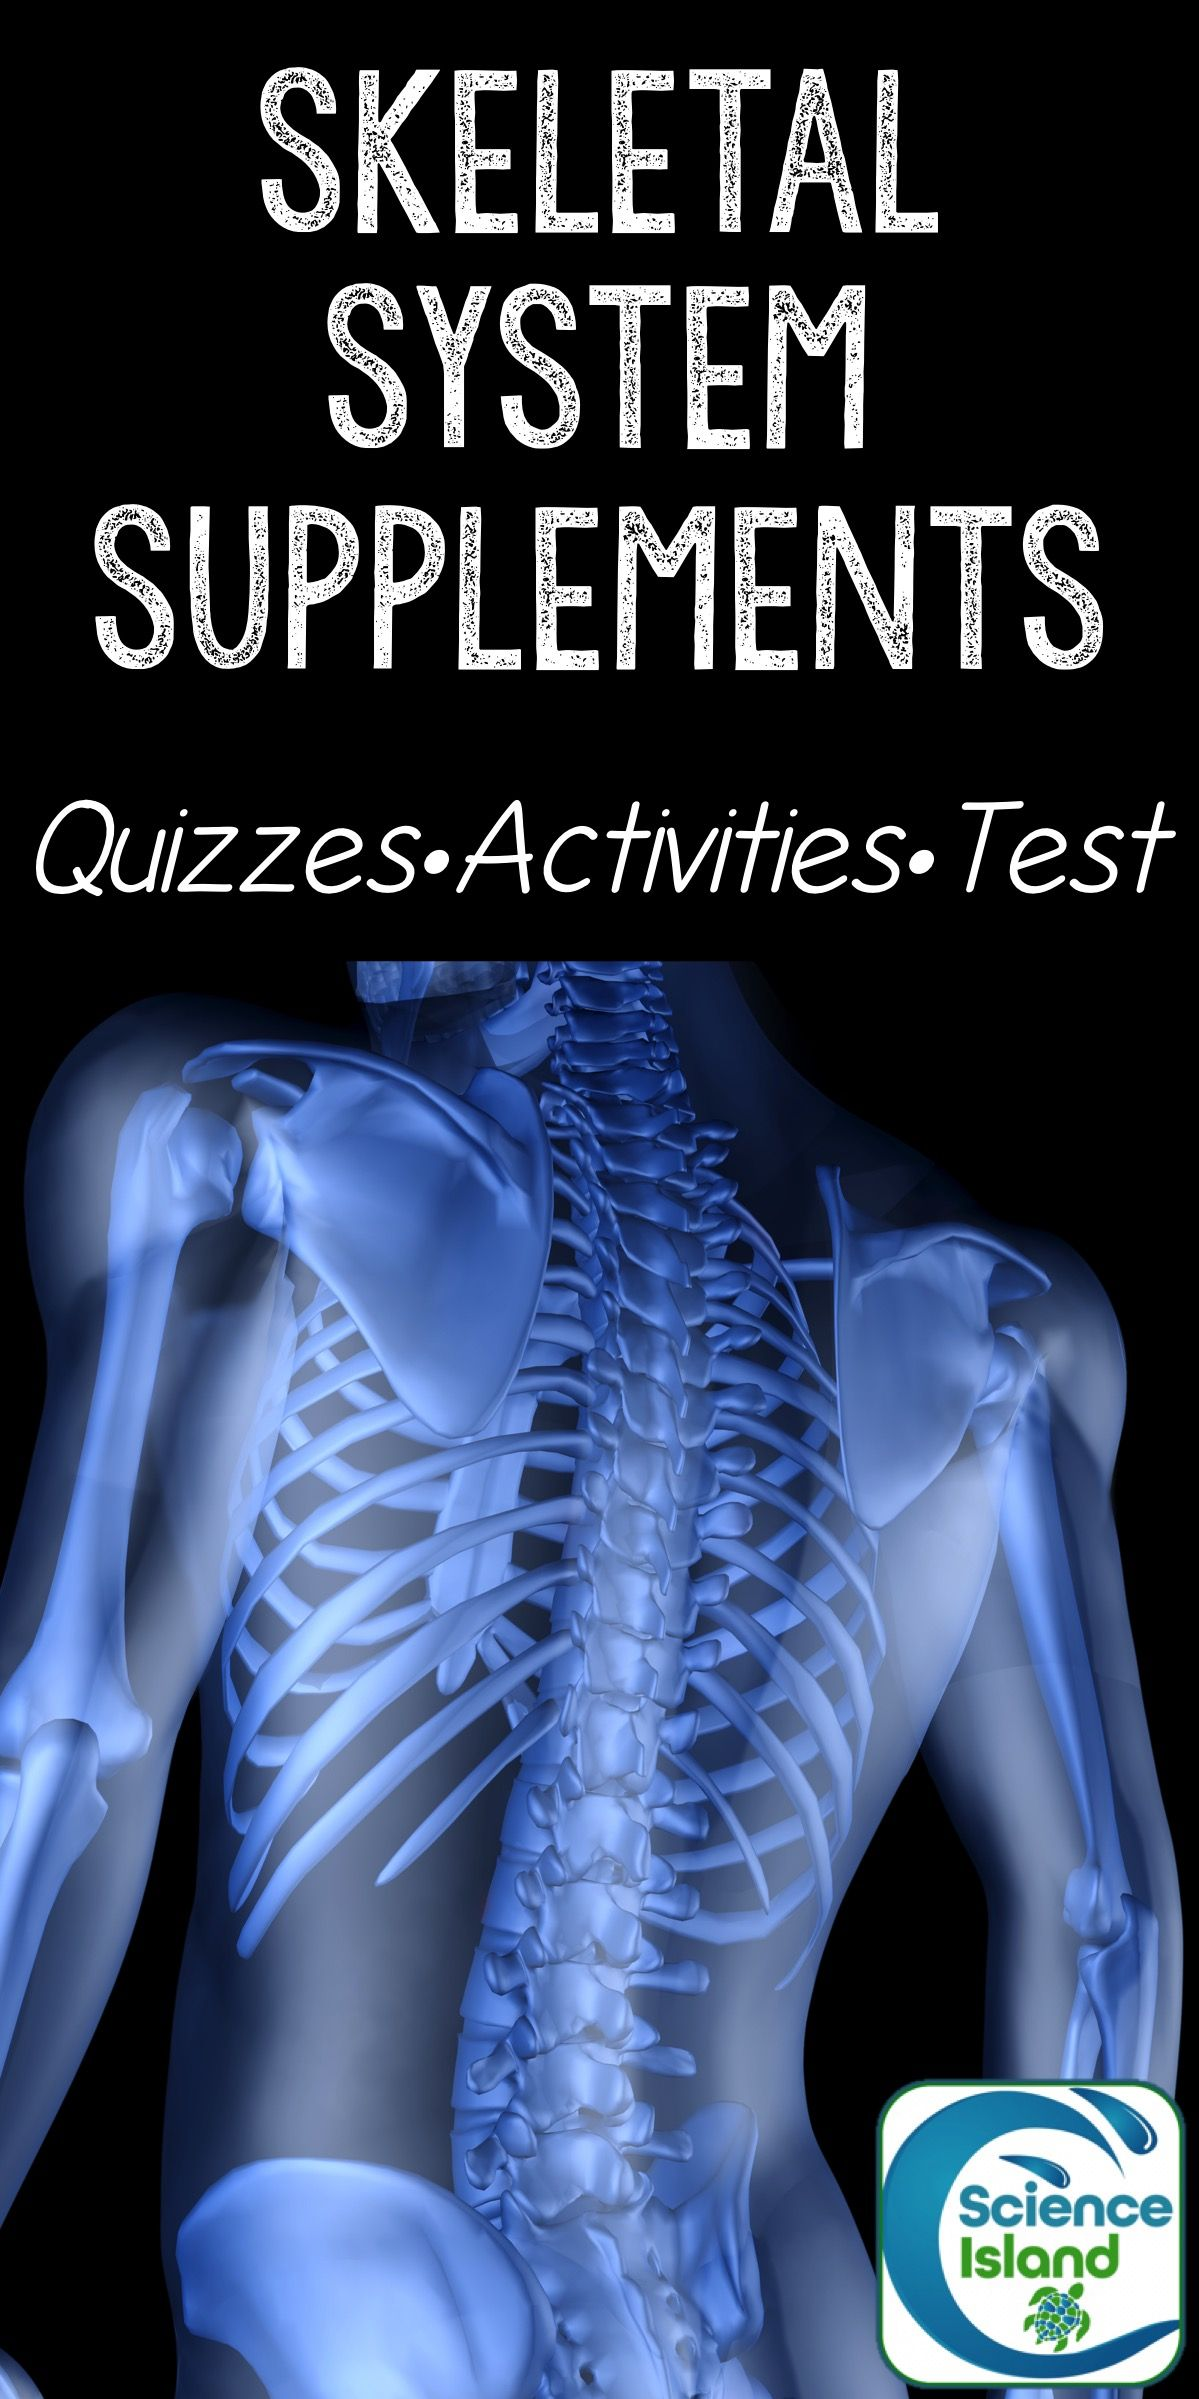 Skeletal System Supplements For Instruction And Assessment